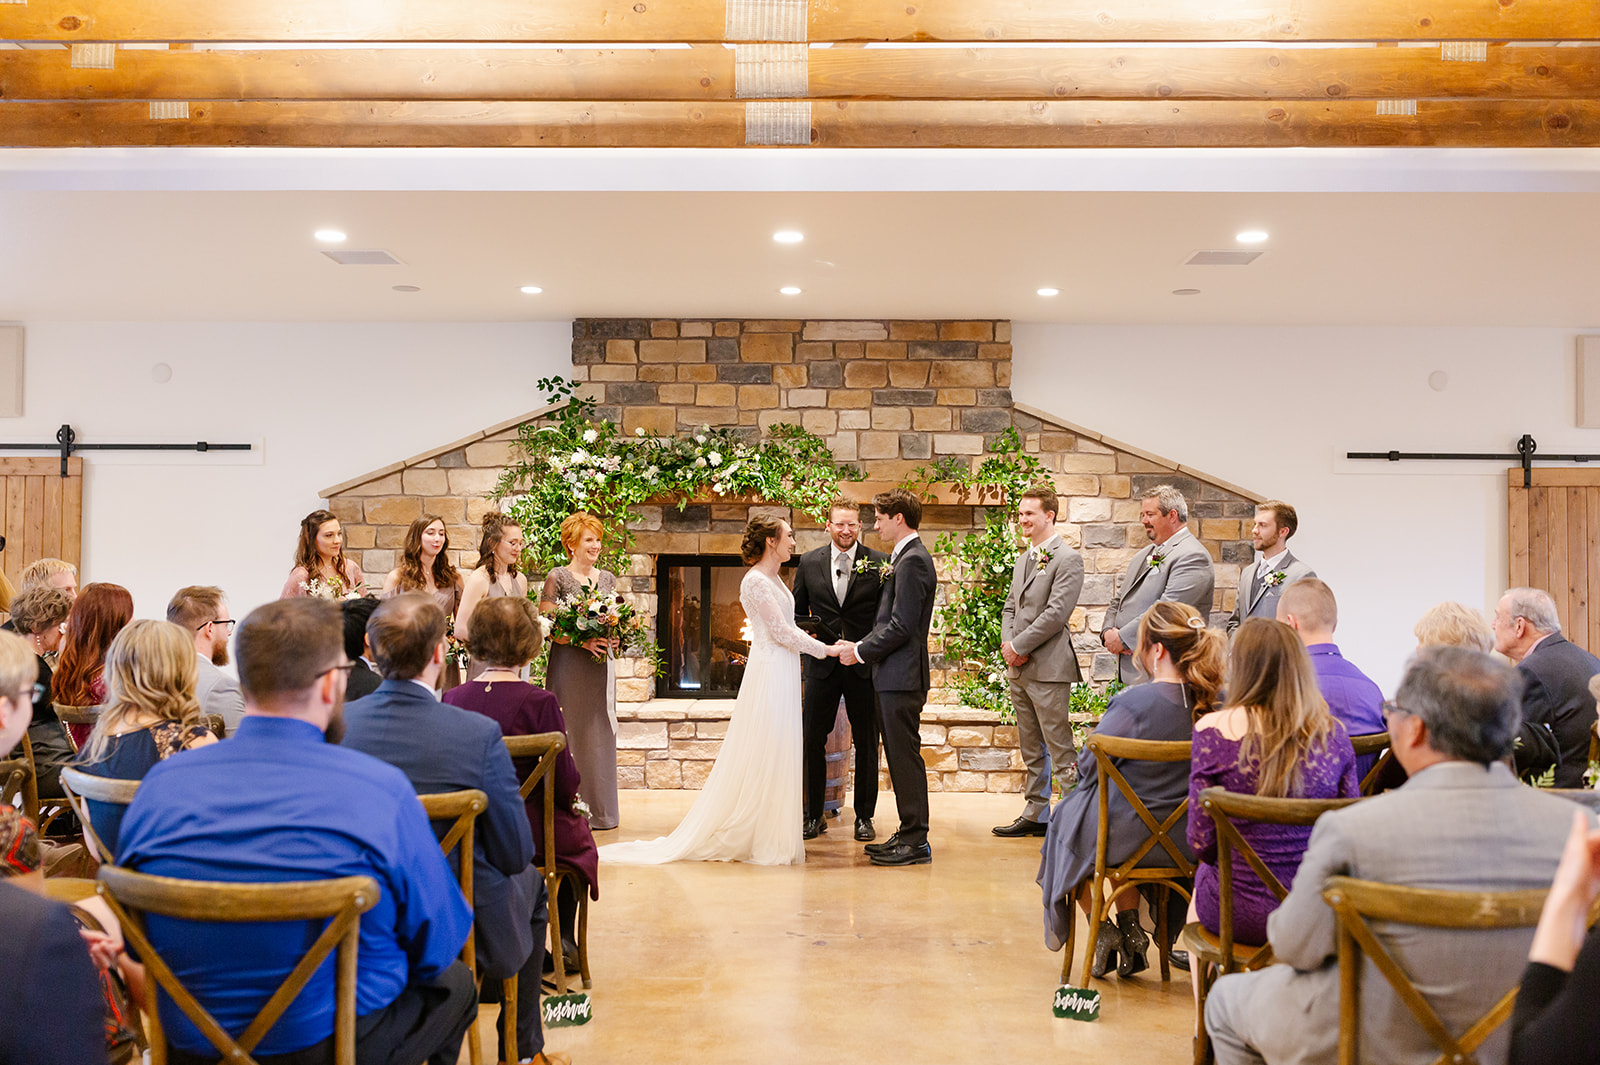 Mega Wedding Planner's Wedding Blog The Design: The Hearth House Venue Hearth House